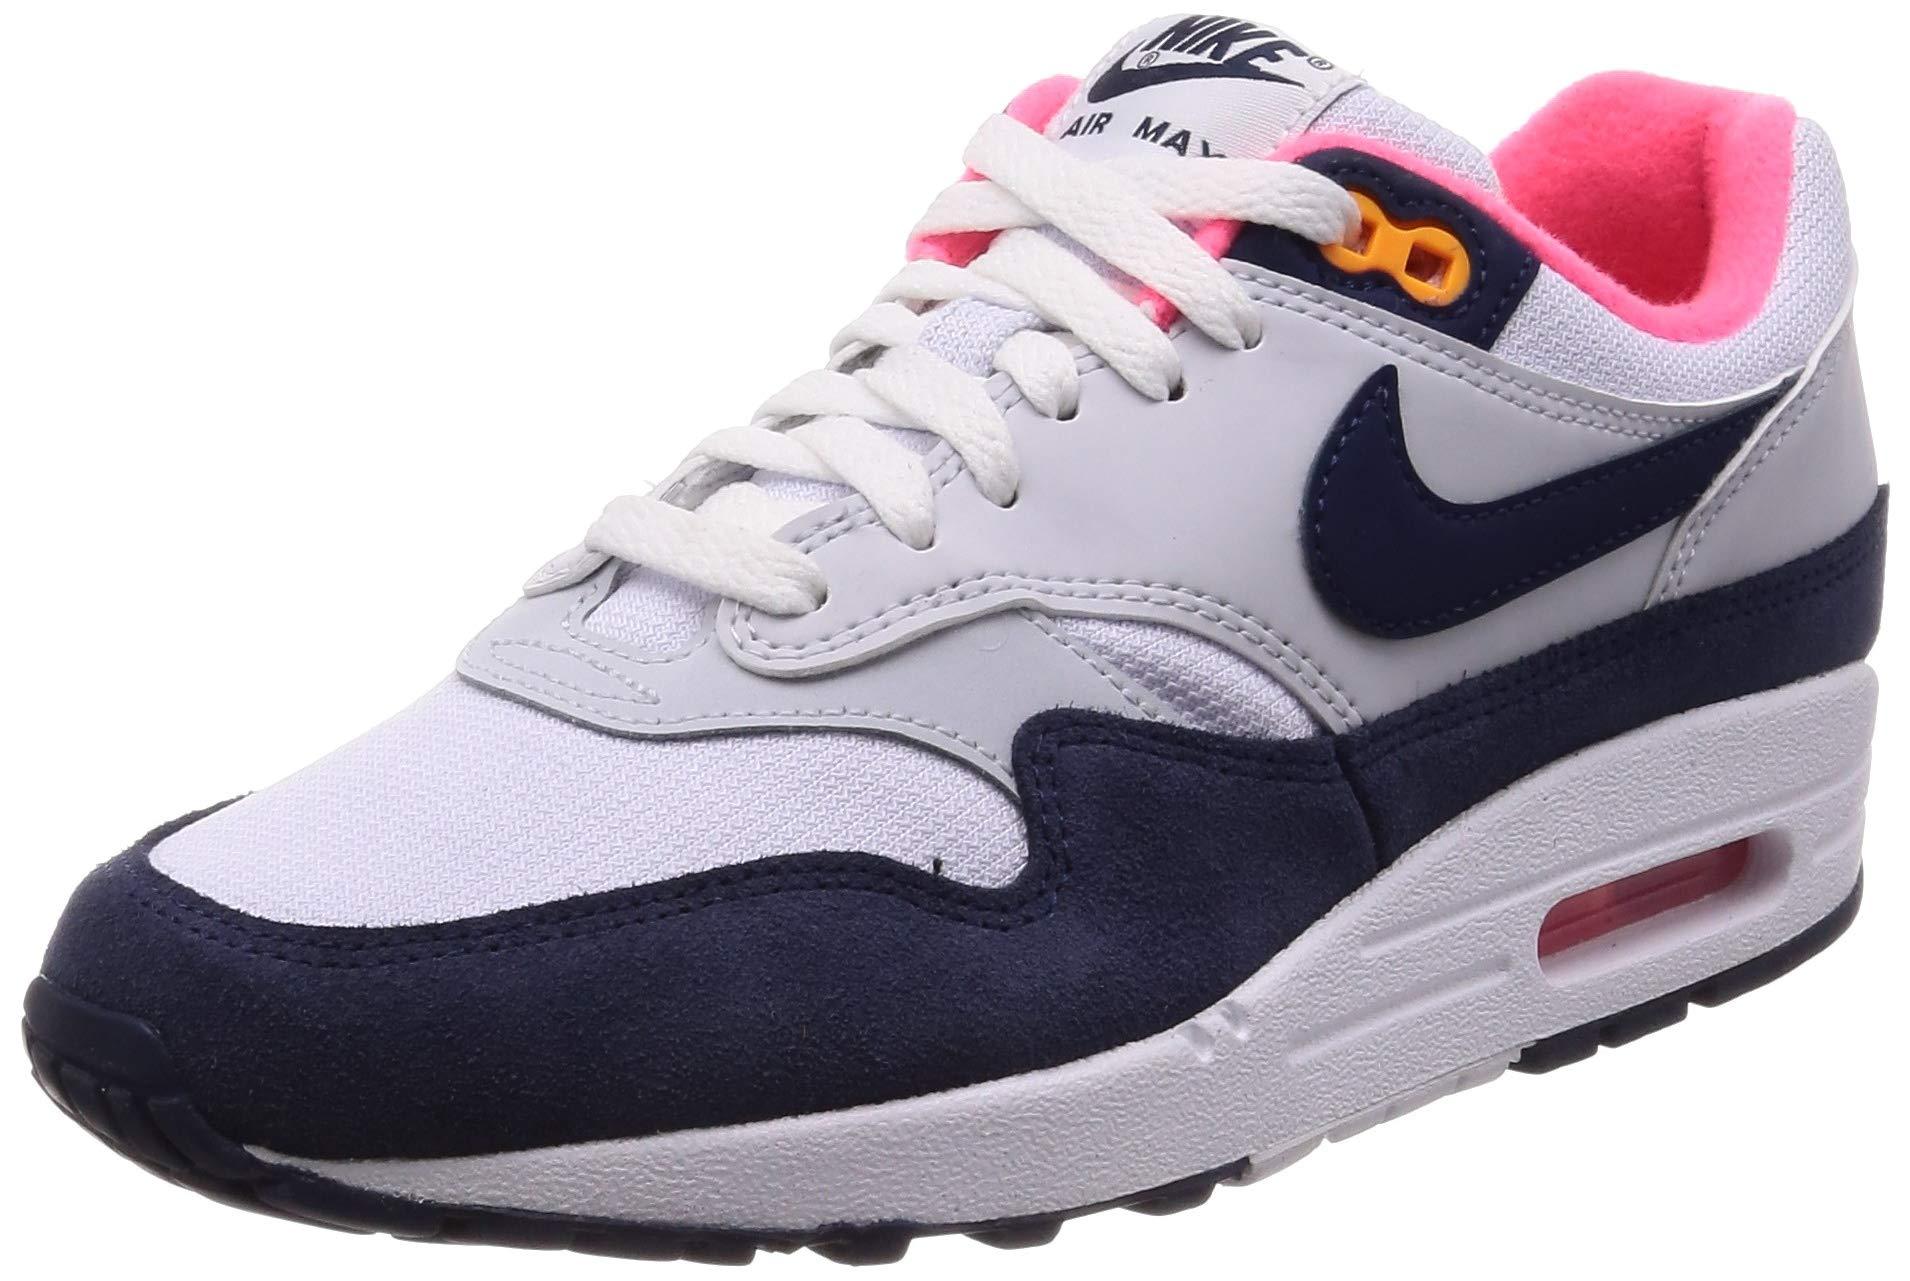 Nike Damen WMNS Air Max 1 Laufschuhe